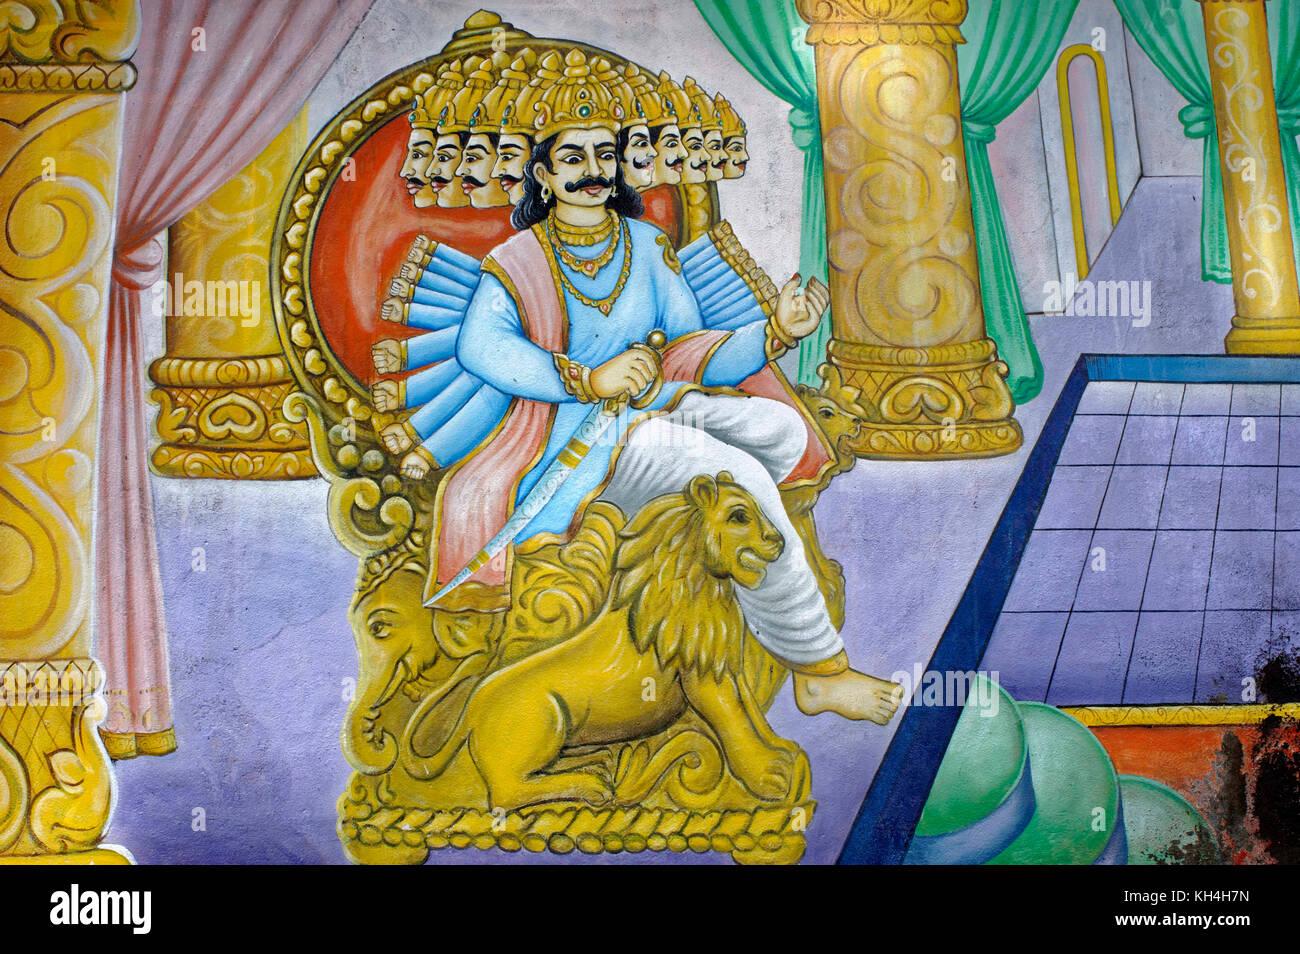 Ravana Gemälde an der Wand des anjaneya Tempel, Karnataka, Indien, Asien Stockbild